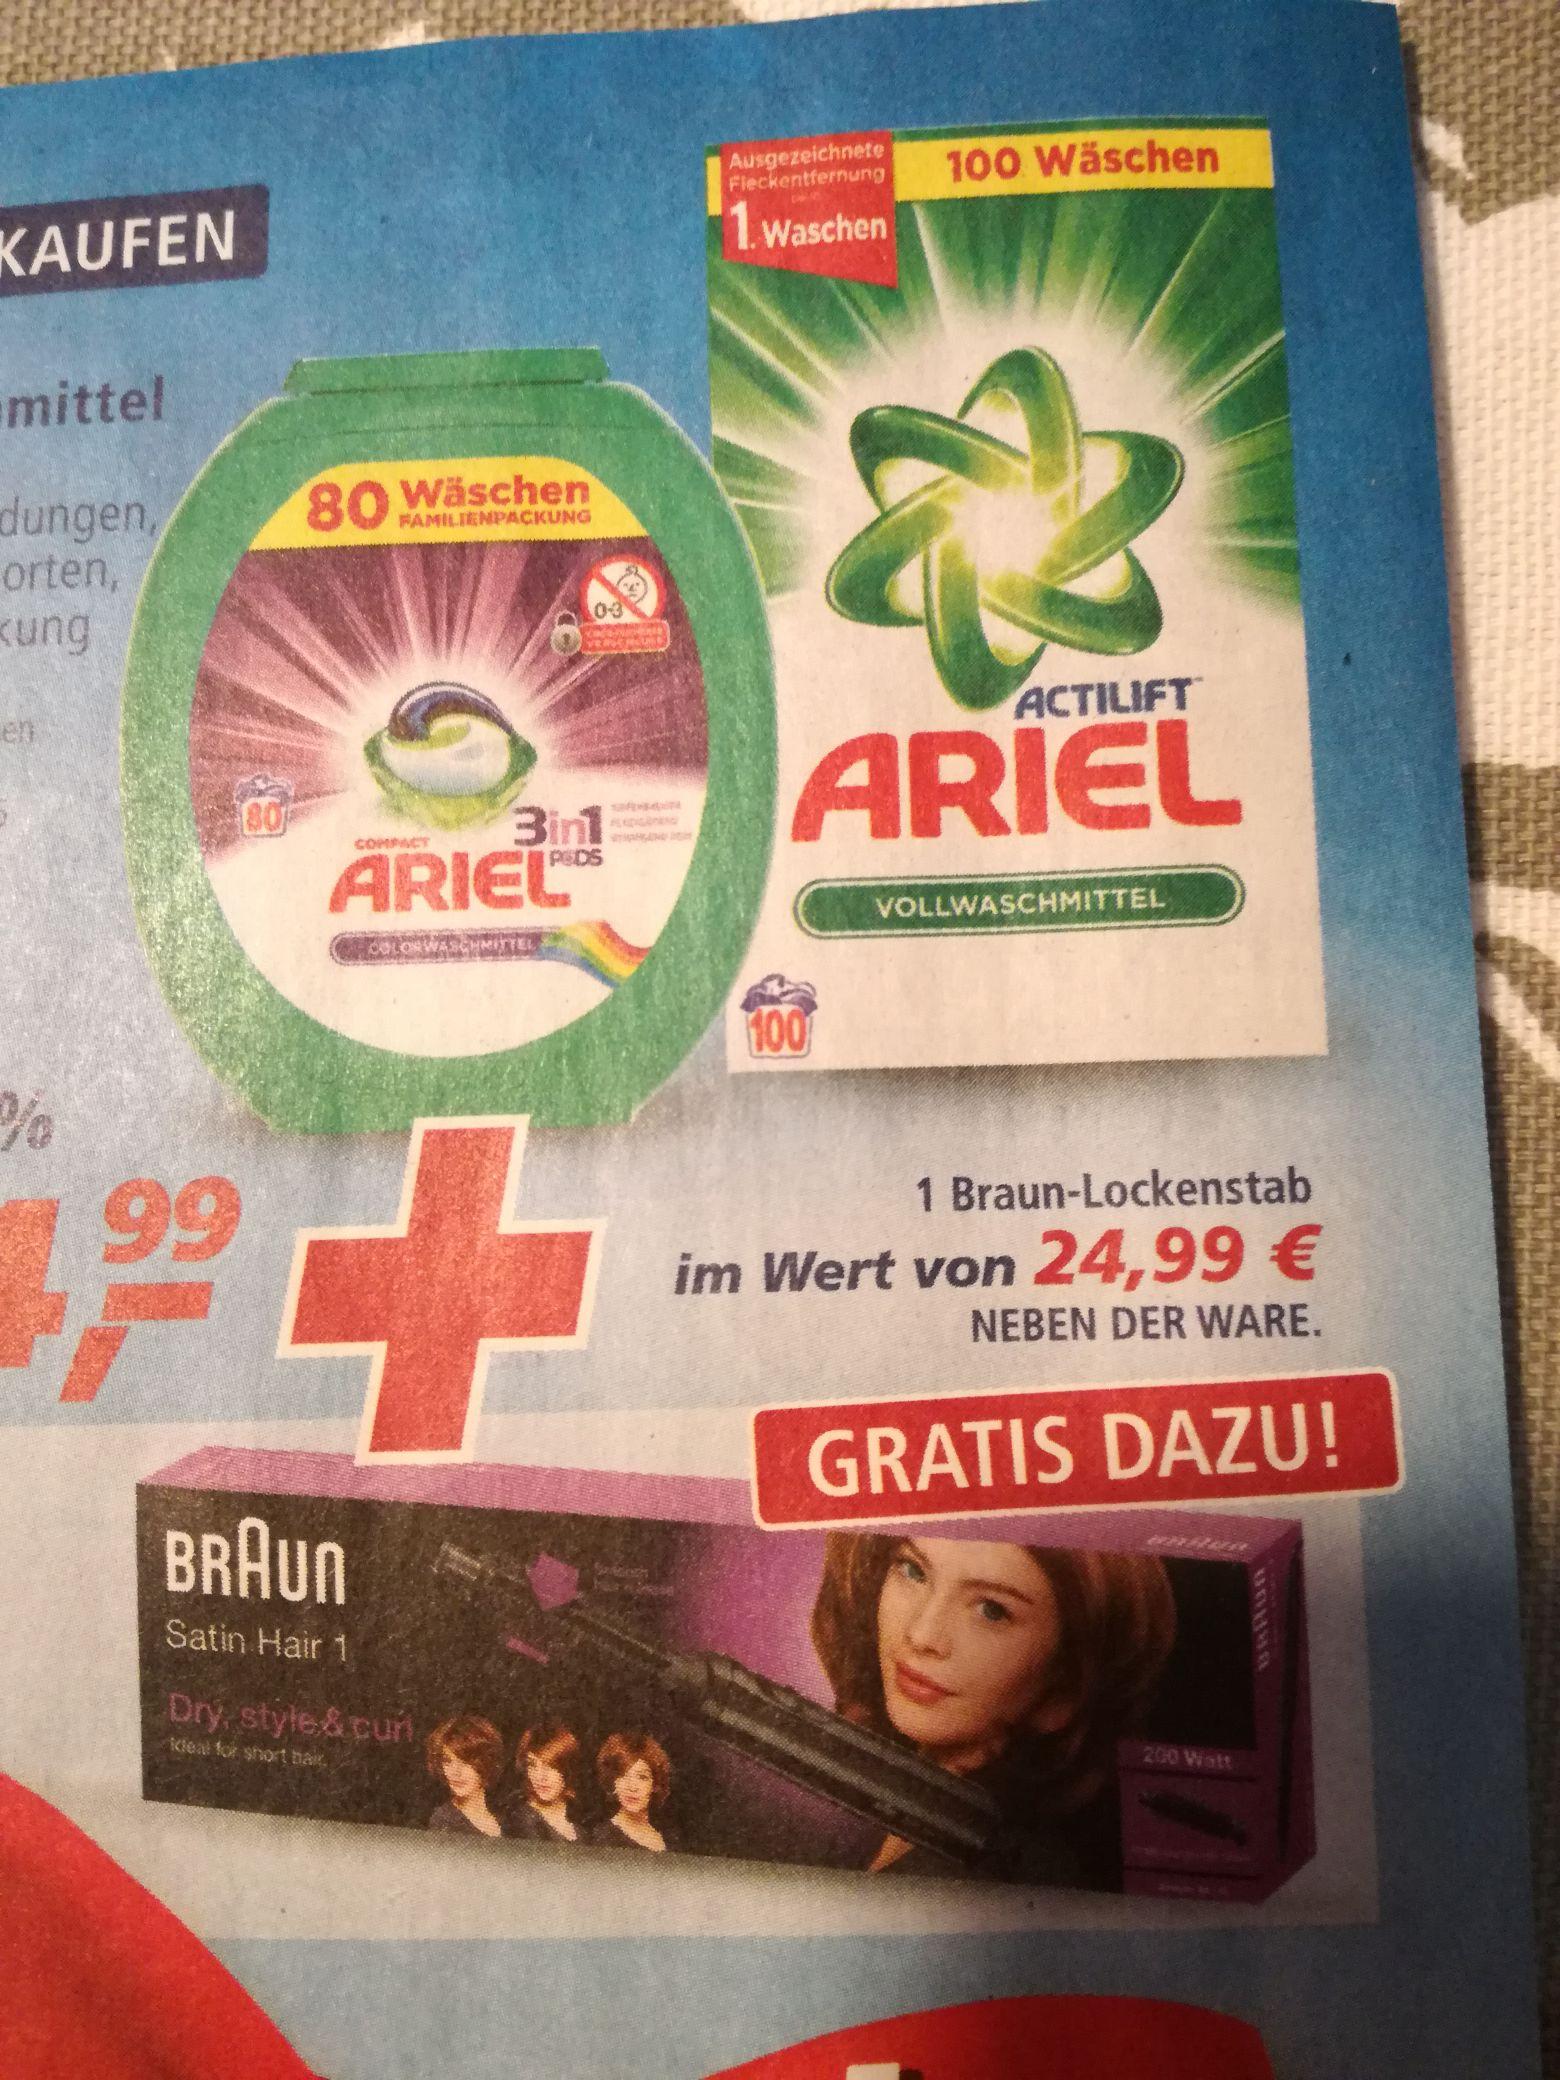 Ariel Waschmittel incl. Braun Lockenstab Satin Hair 1